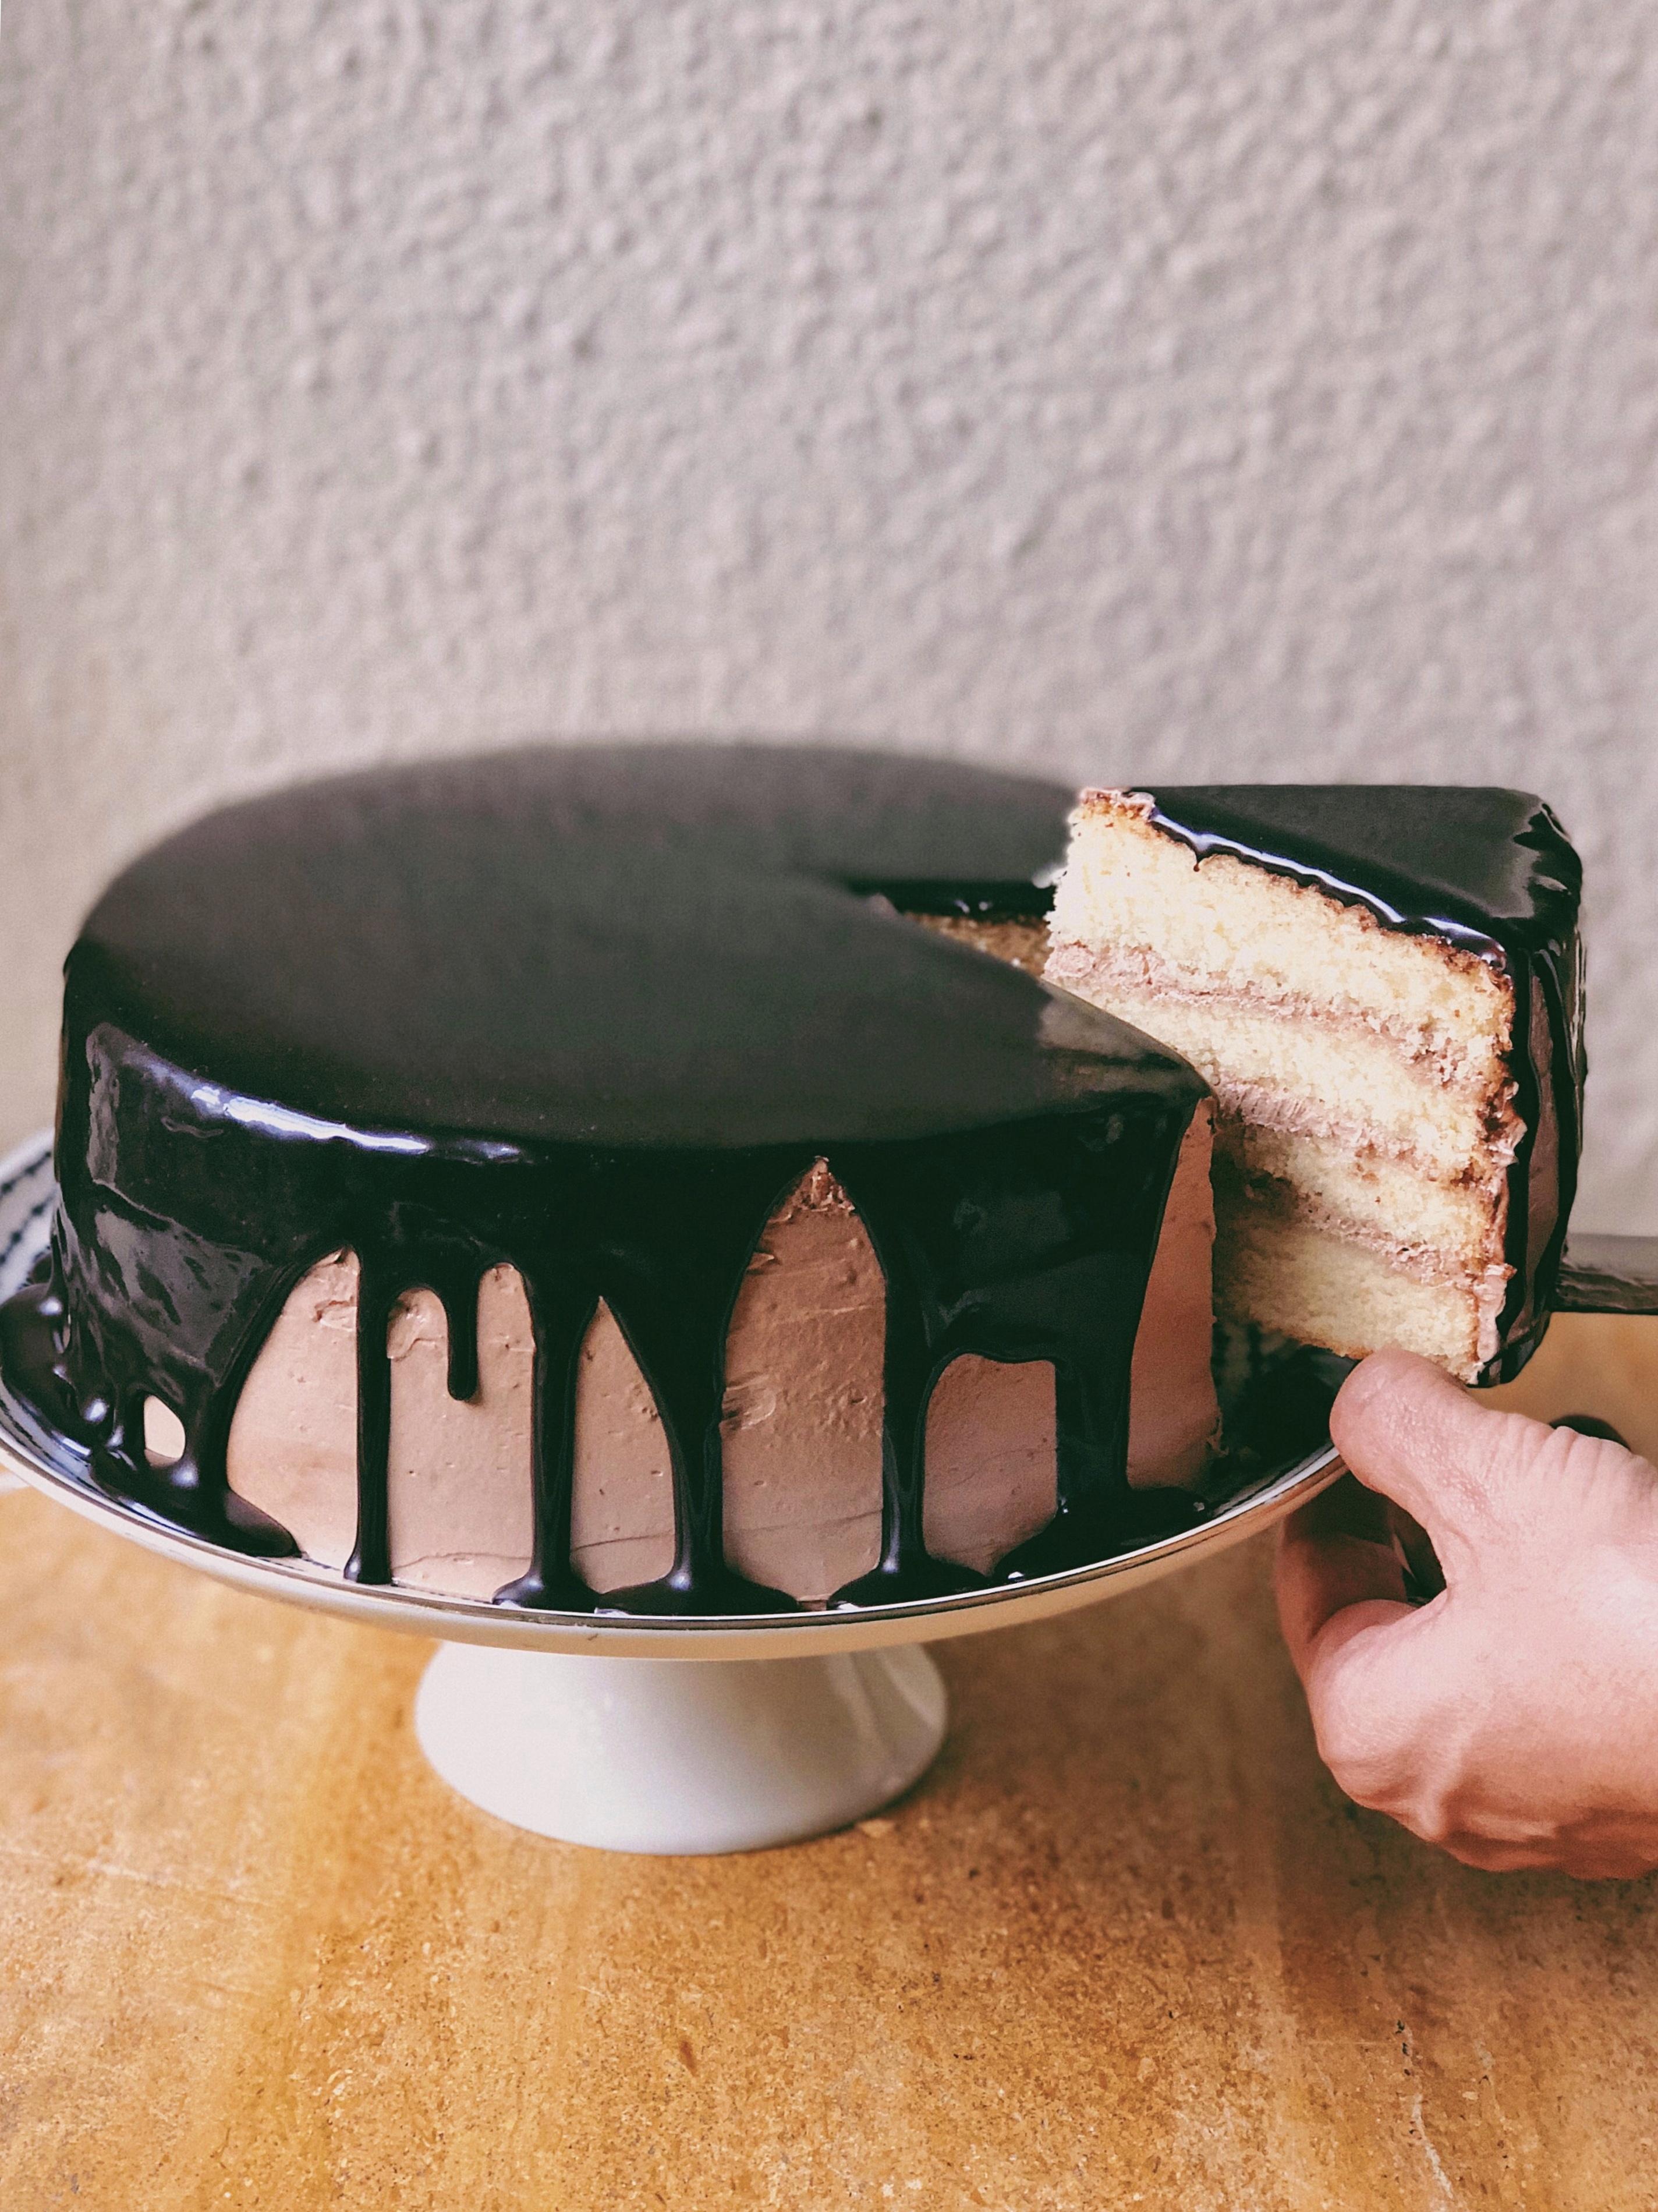 Mastering The Beranbaum White Velvet Cake With French Chocolate Buttercream